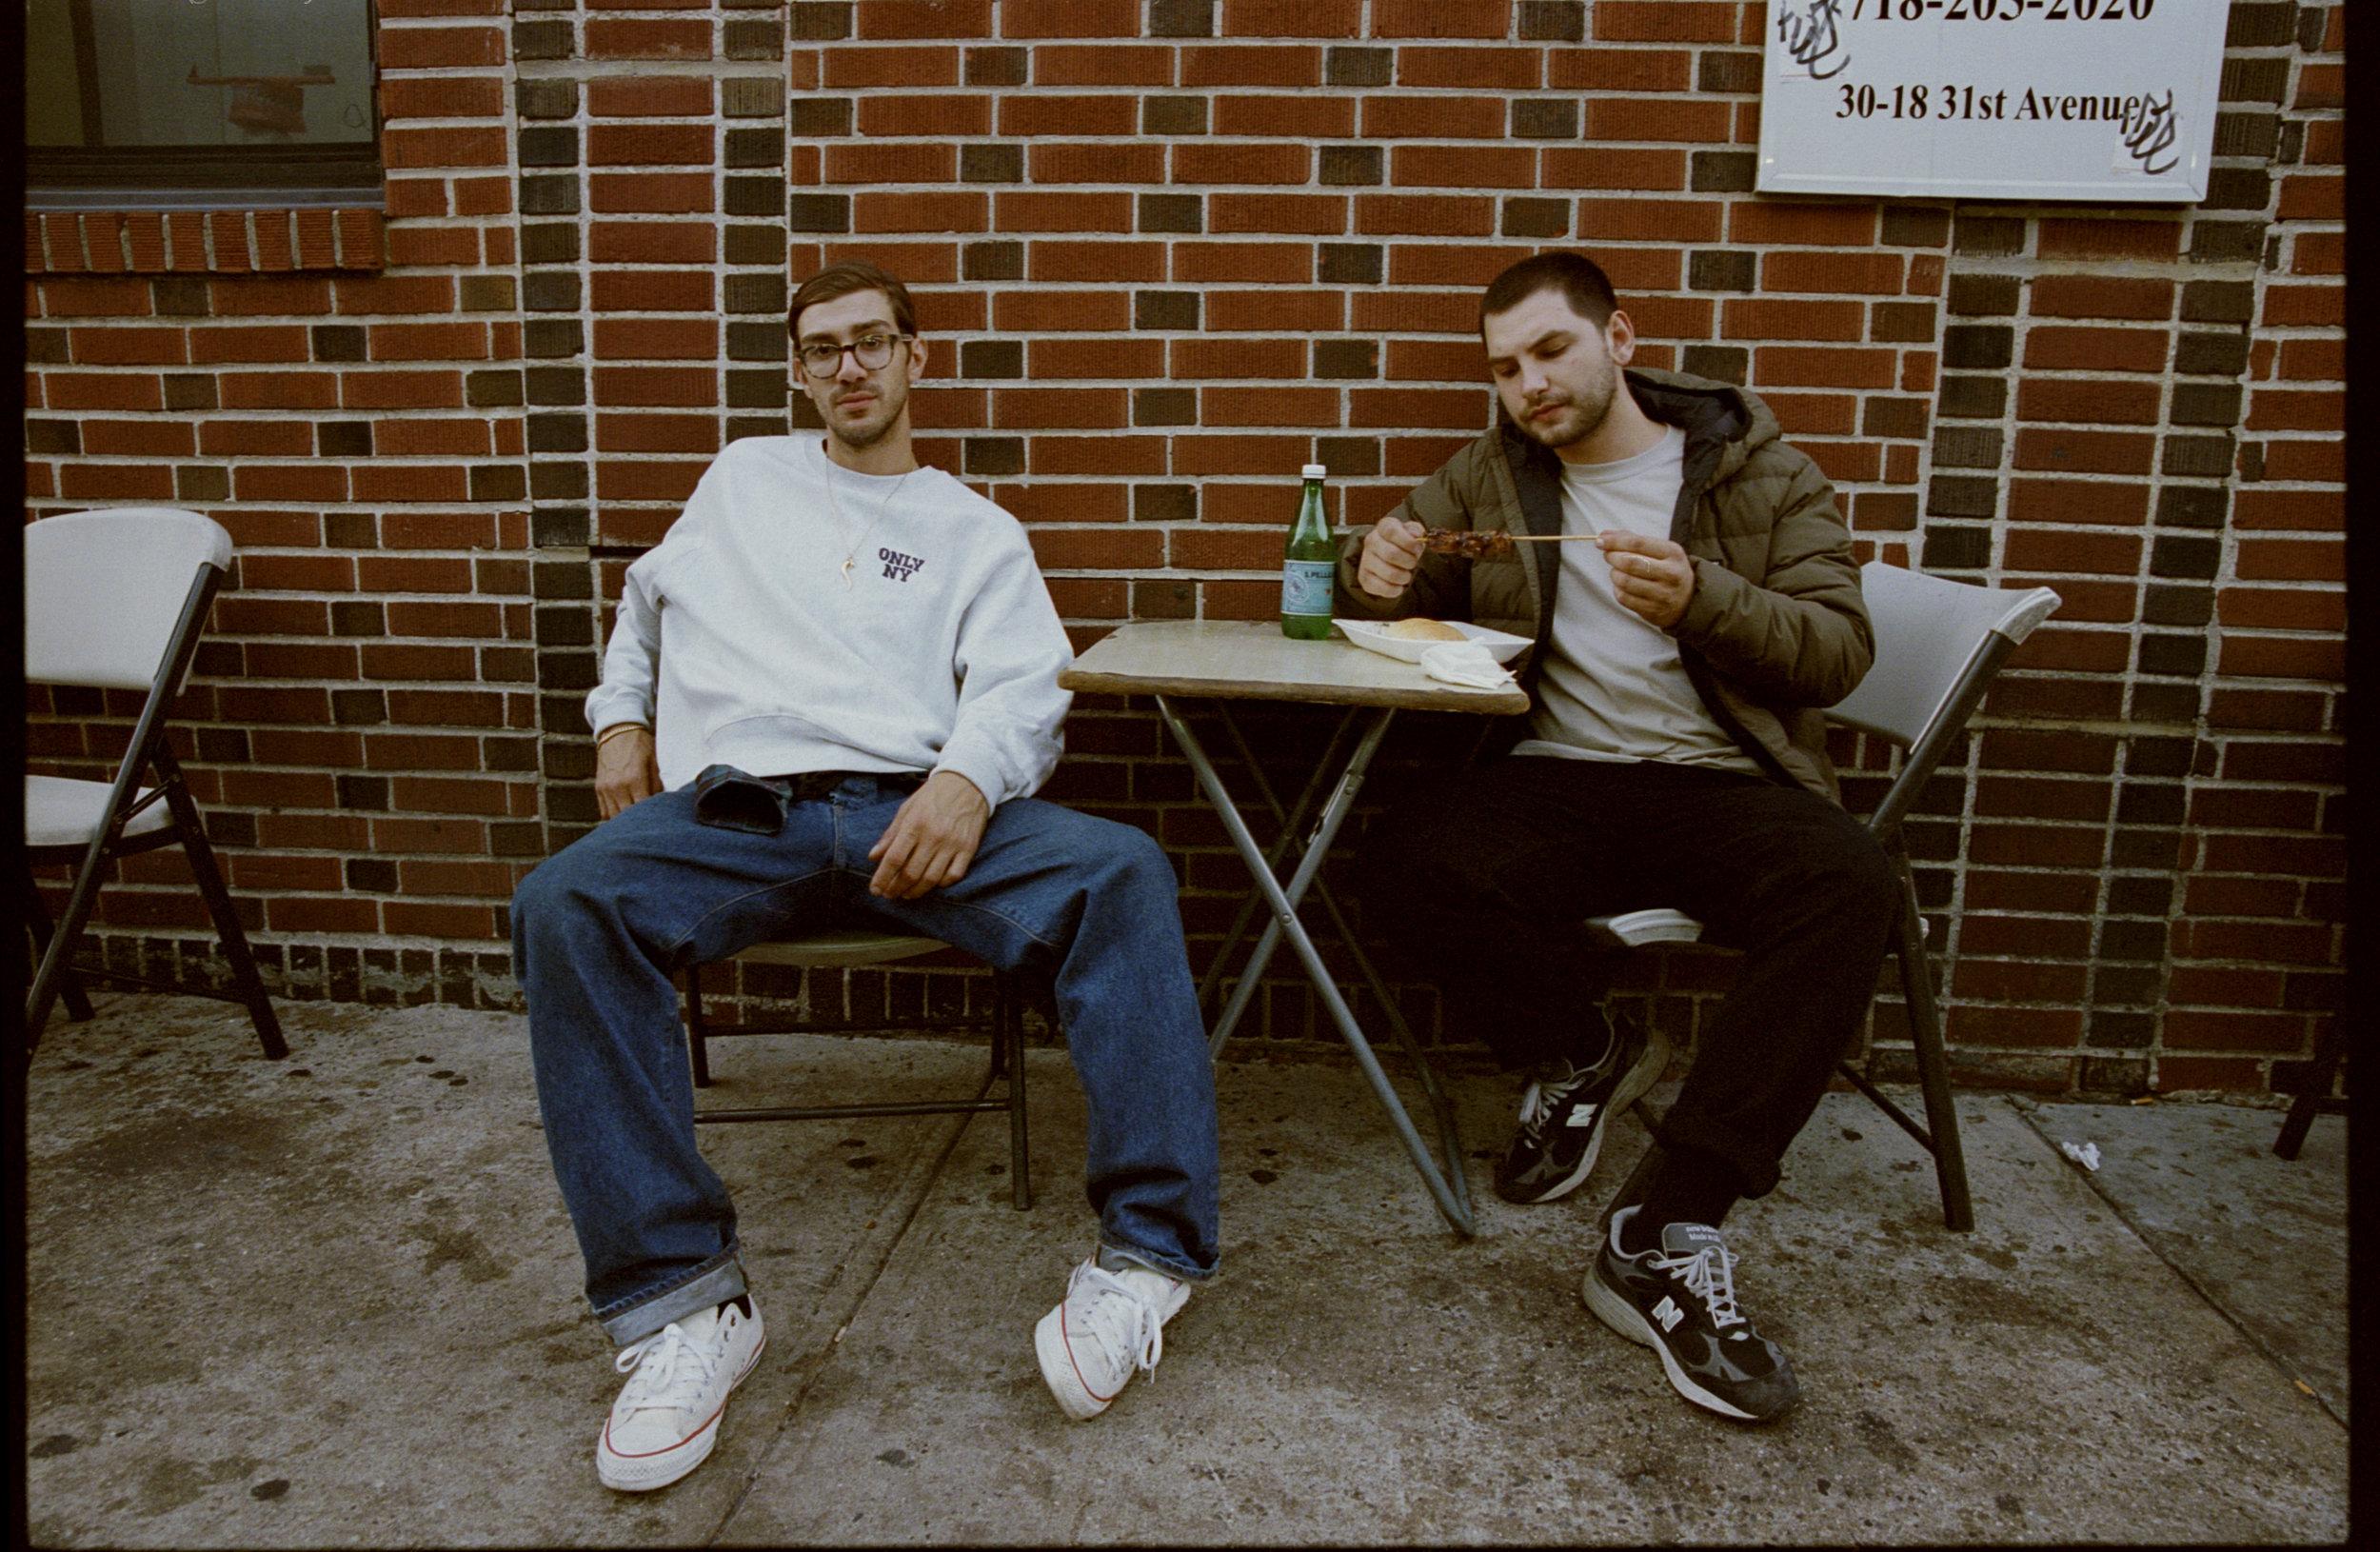 Dom and Geri Eating Souvlaki King #2, 2017 Cropped Minimal Border E1.jpg